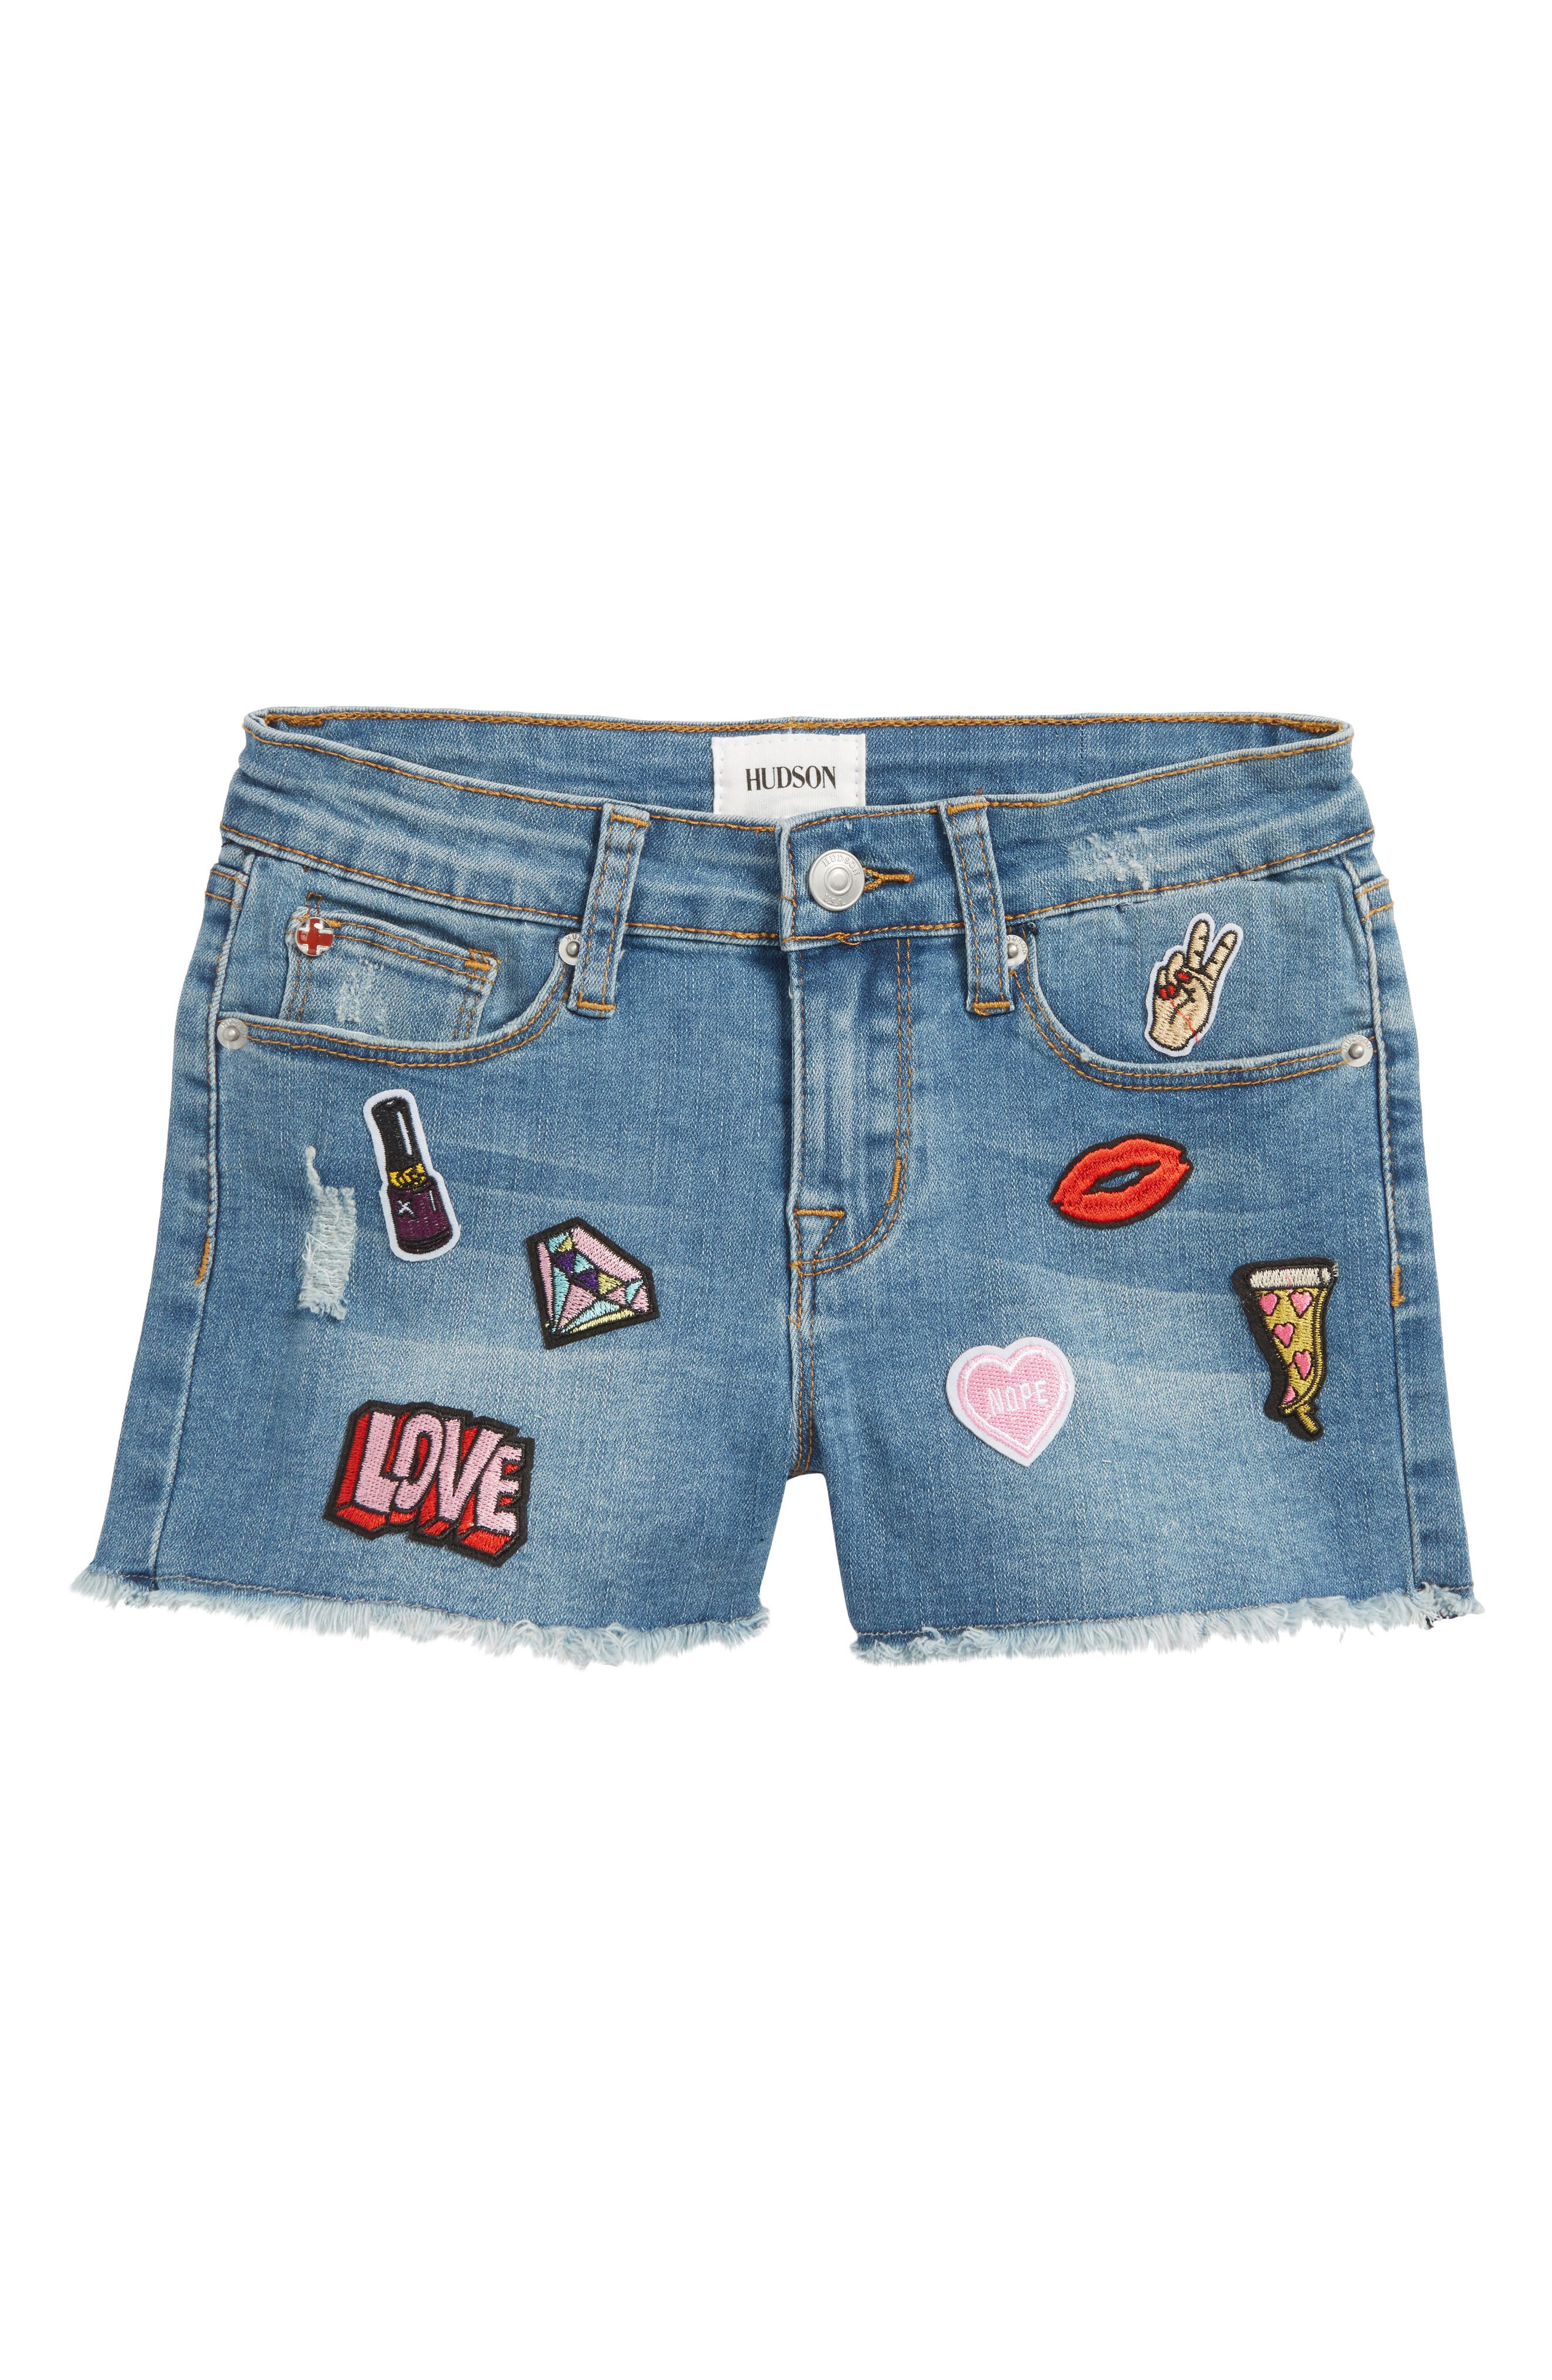 Patchy Cutoff Denim Shorts,                         Main,                         color, 400